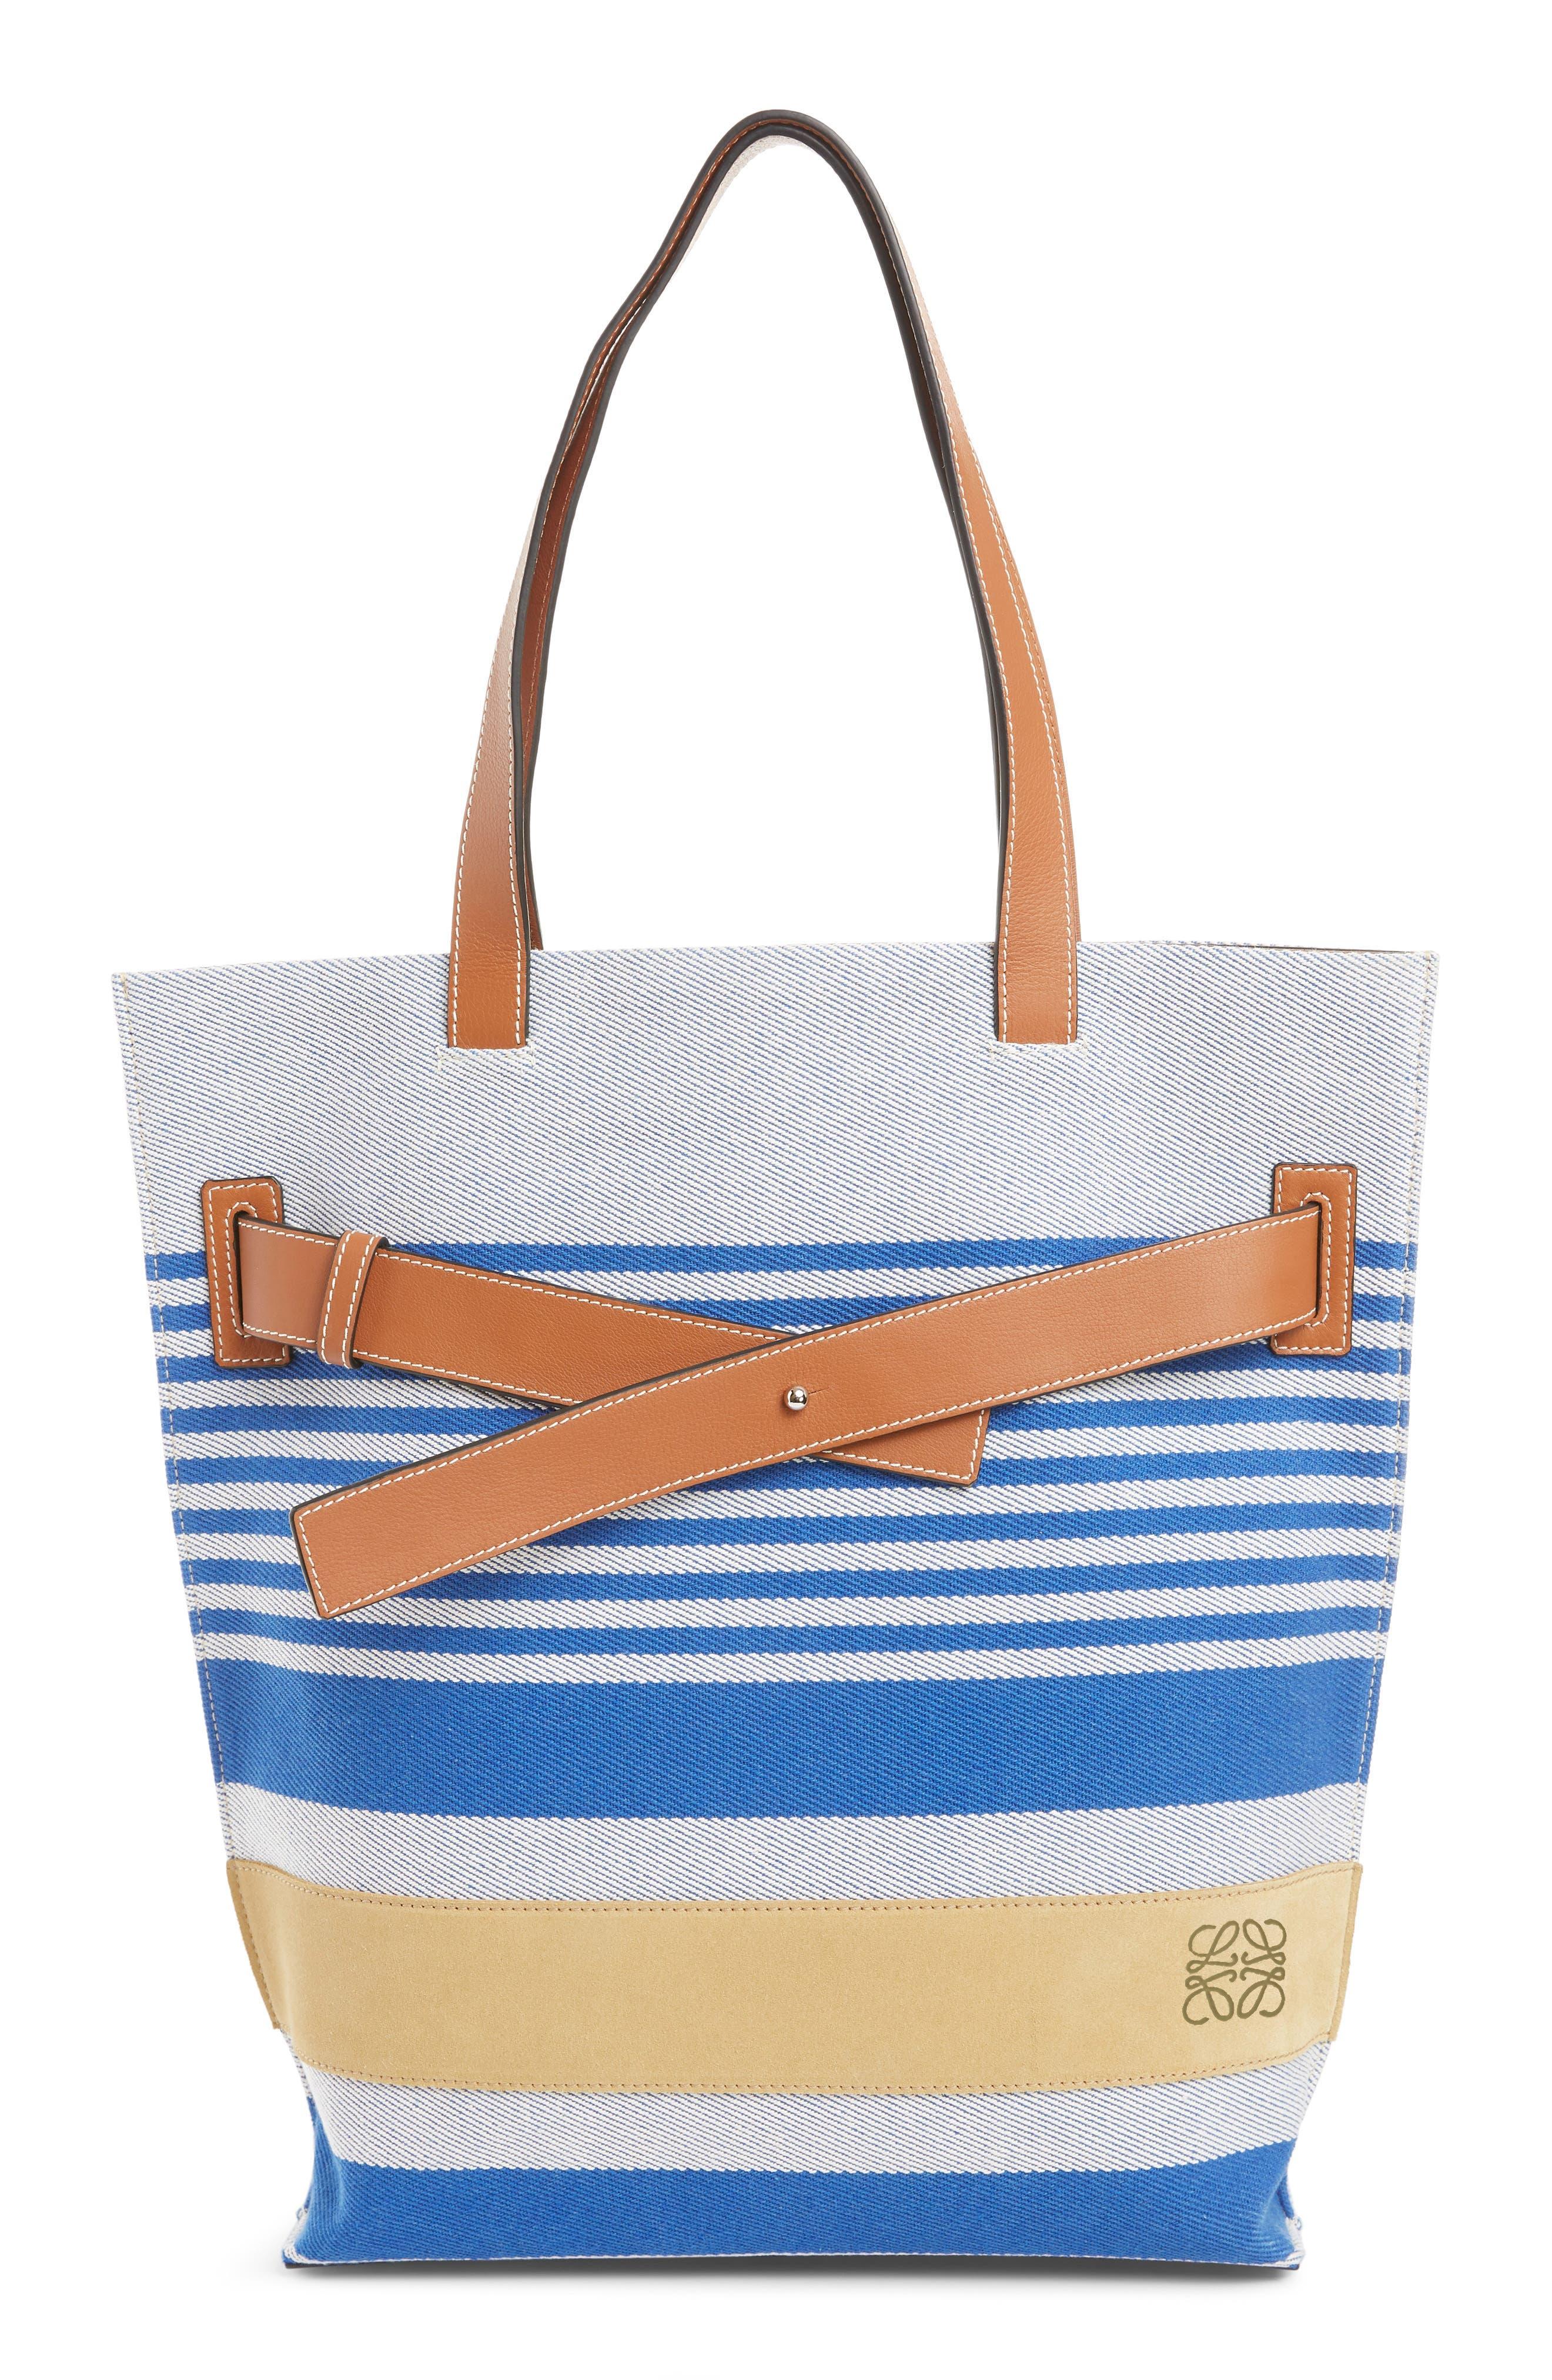 LOEWE, Stripe Twill Tote Bag, Main thumbnail 1, color, PACIFIC BLUE/MULTICOLOR